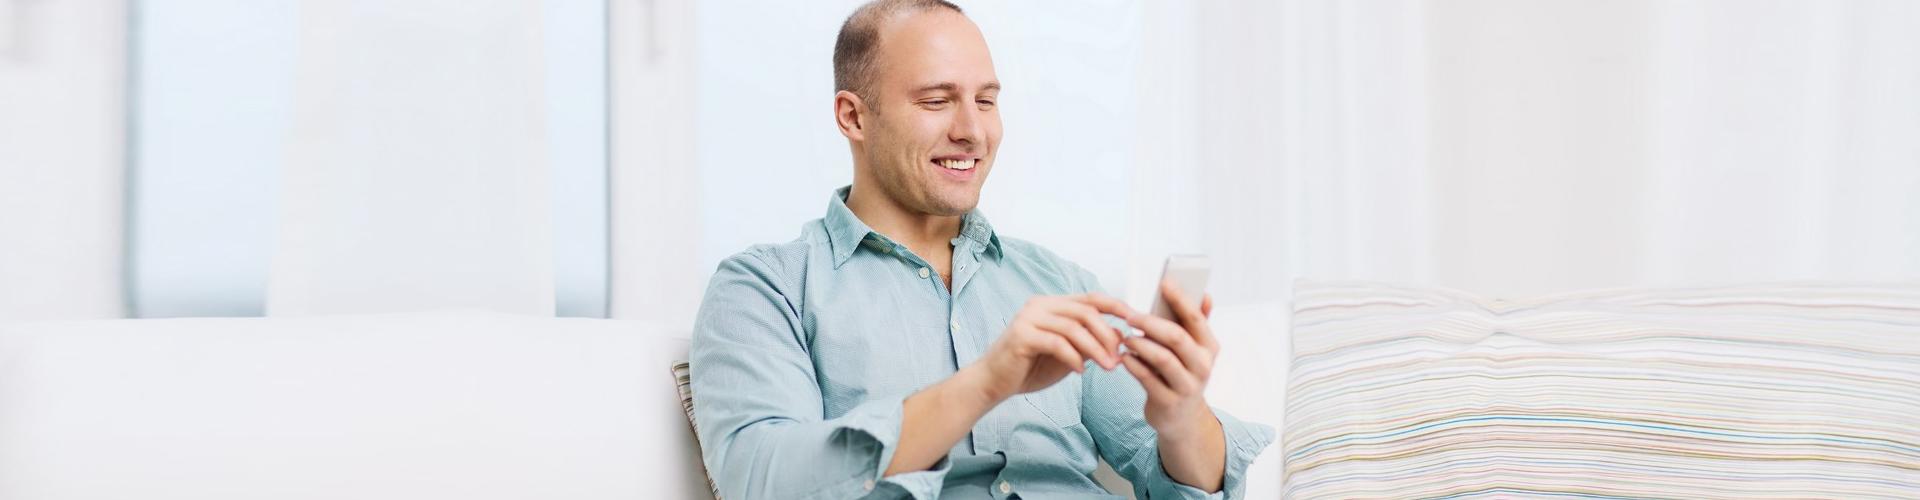 a man using his phone